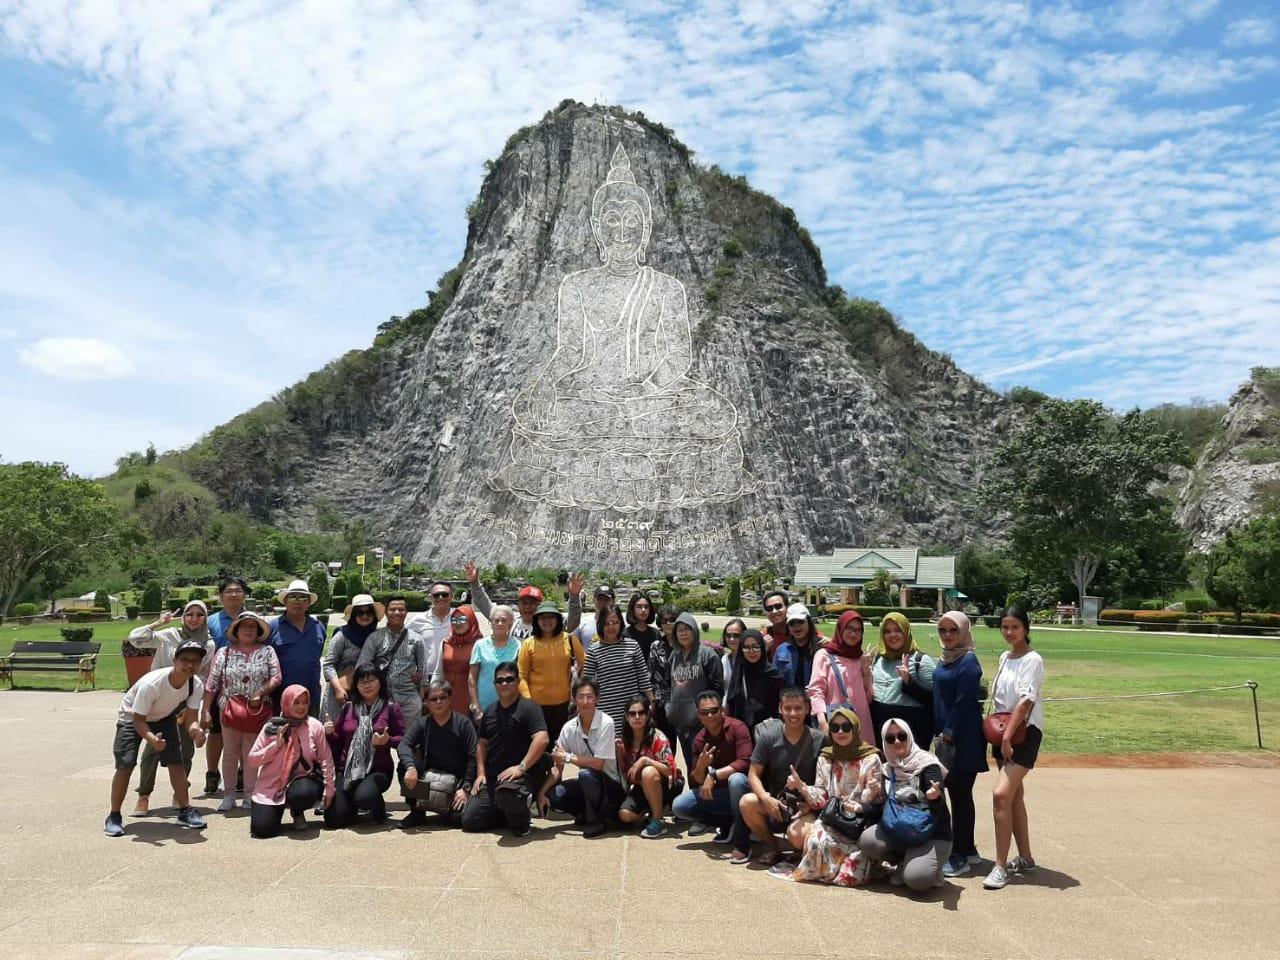 BANGKOK PATTAYA 10 - 14 SEPT 2019 (5D4N)